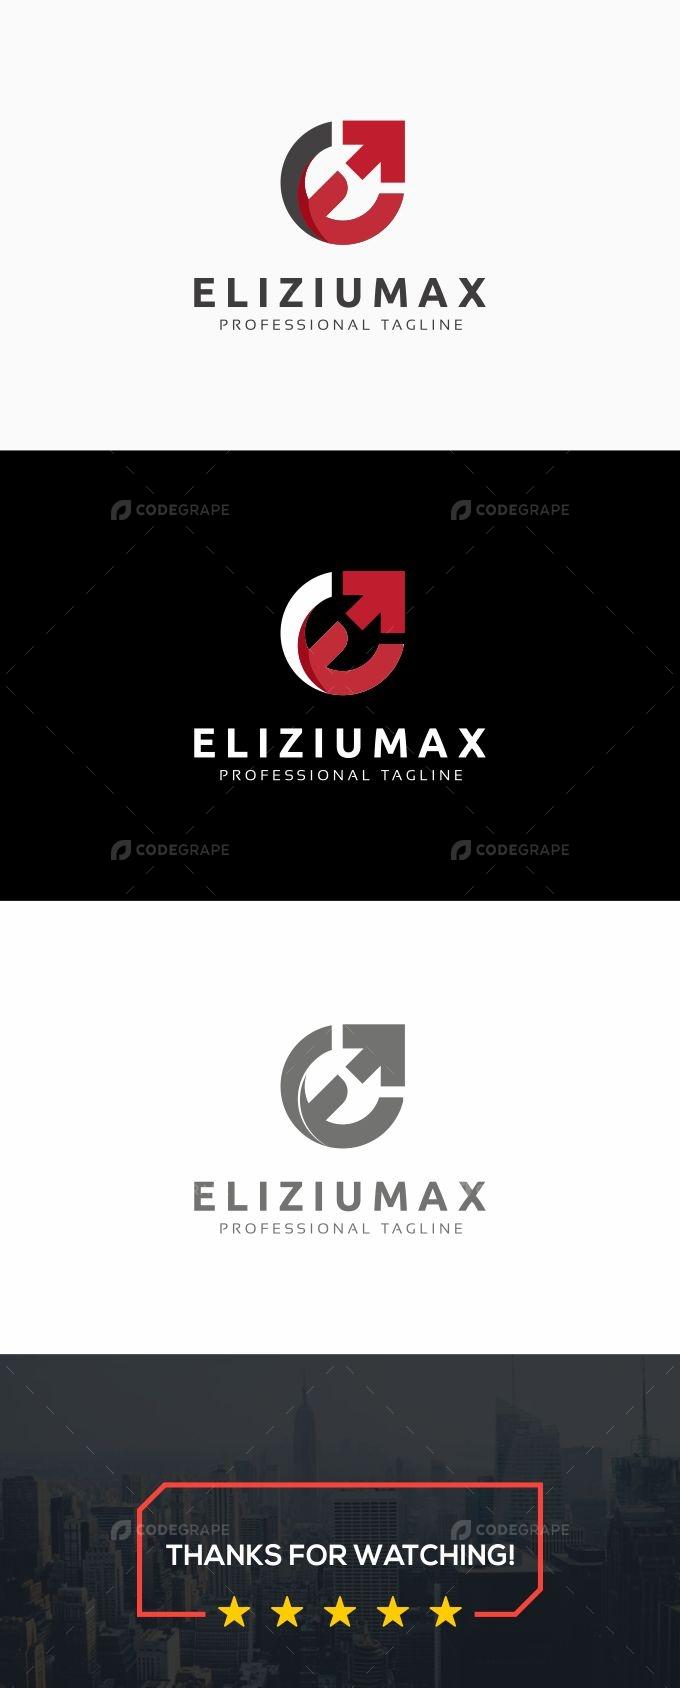 E Letter - Eliziumax Logo